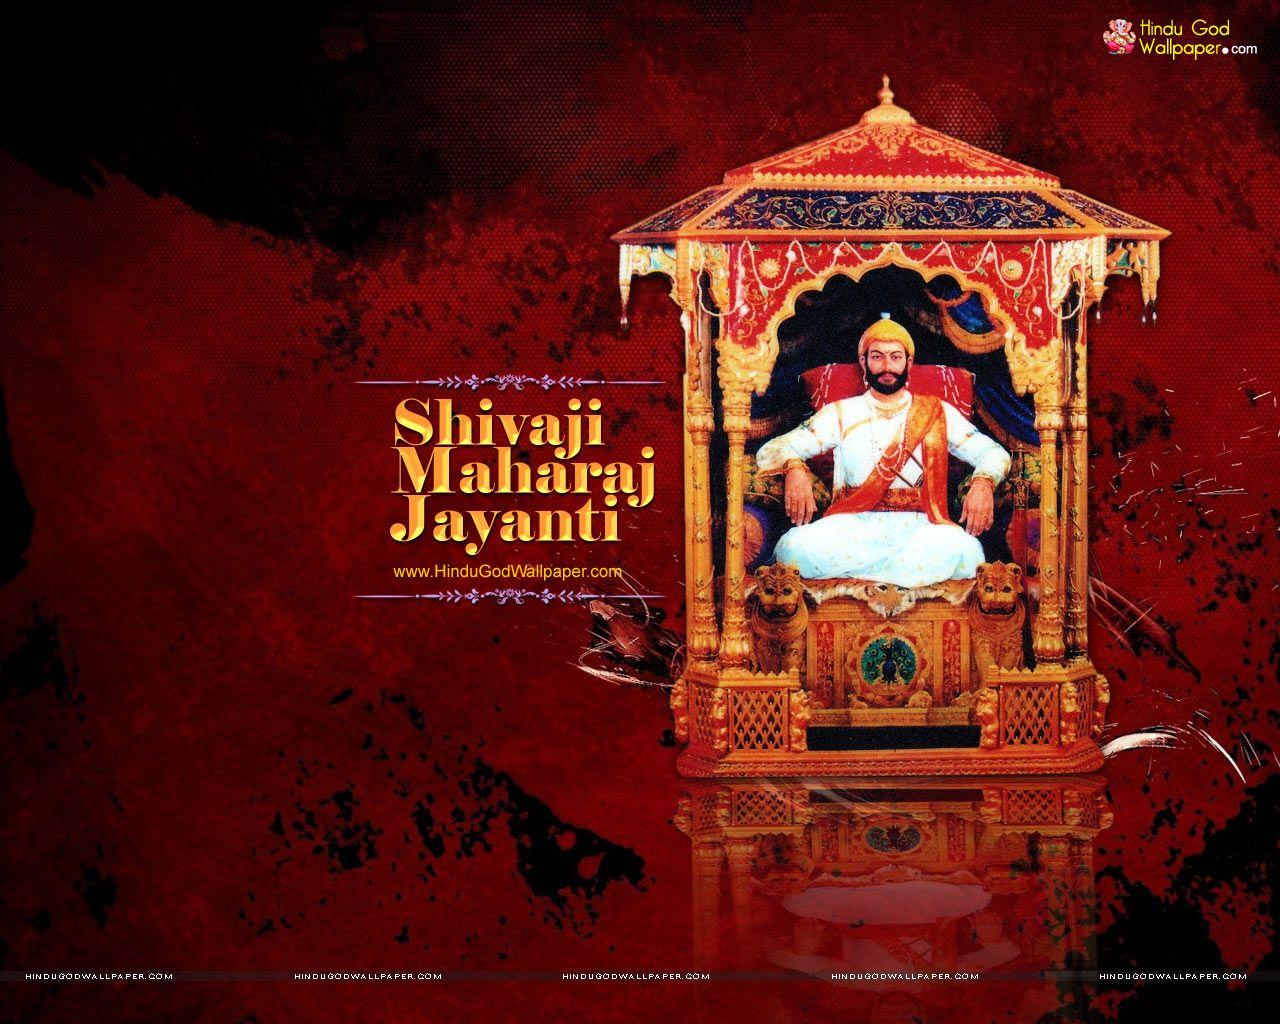 Hd wallpaper shivaji maharaj - Shivaji Jayanti Hd Wallpapers Messages Images Download